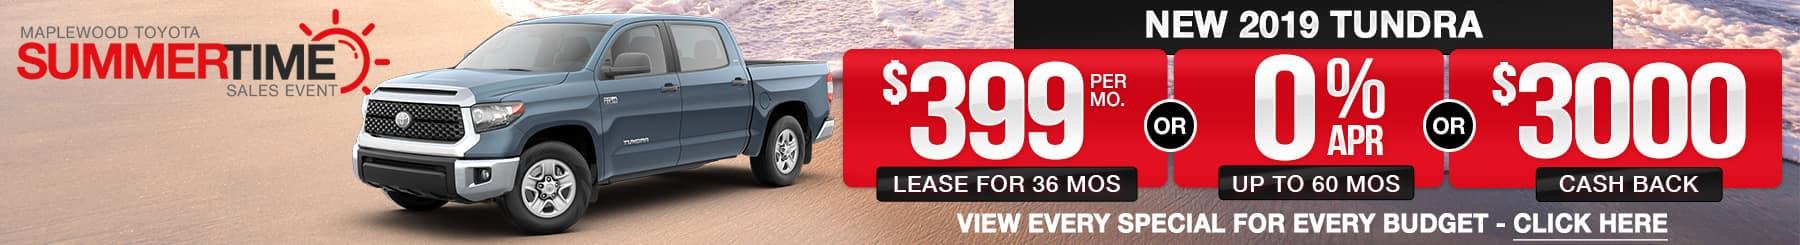 Toyota Tundra Lease Finance Offers